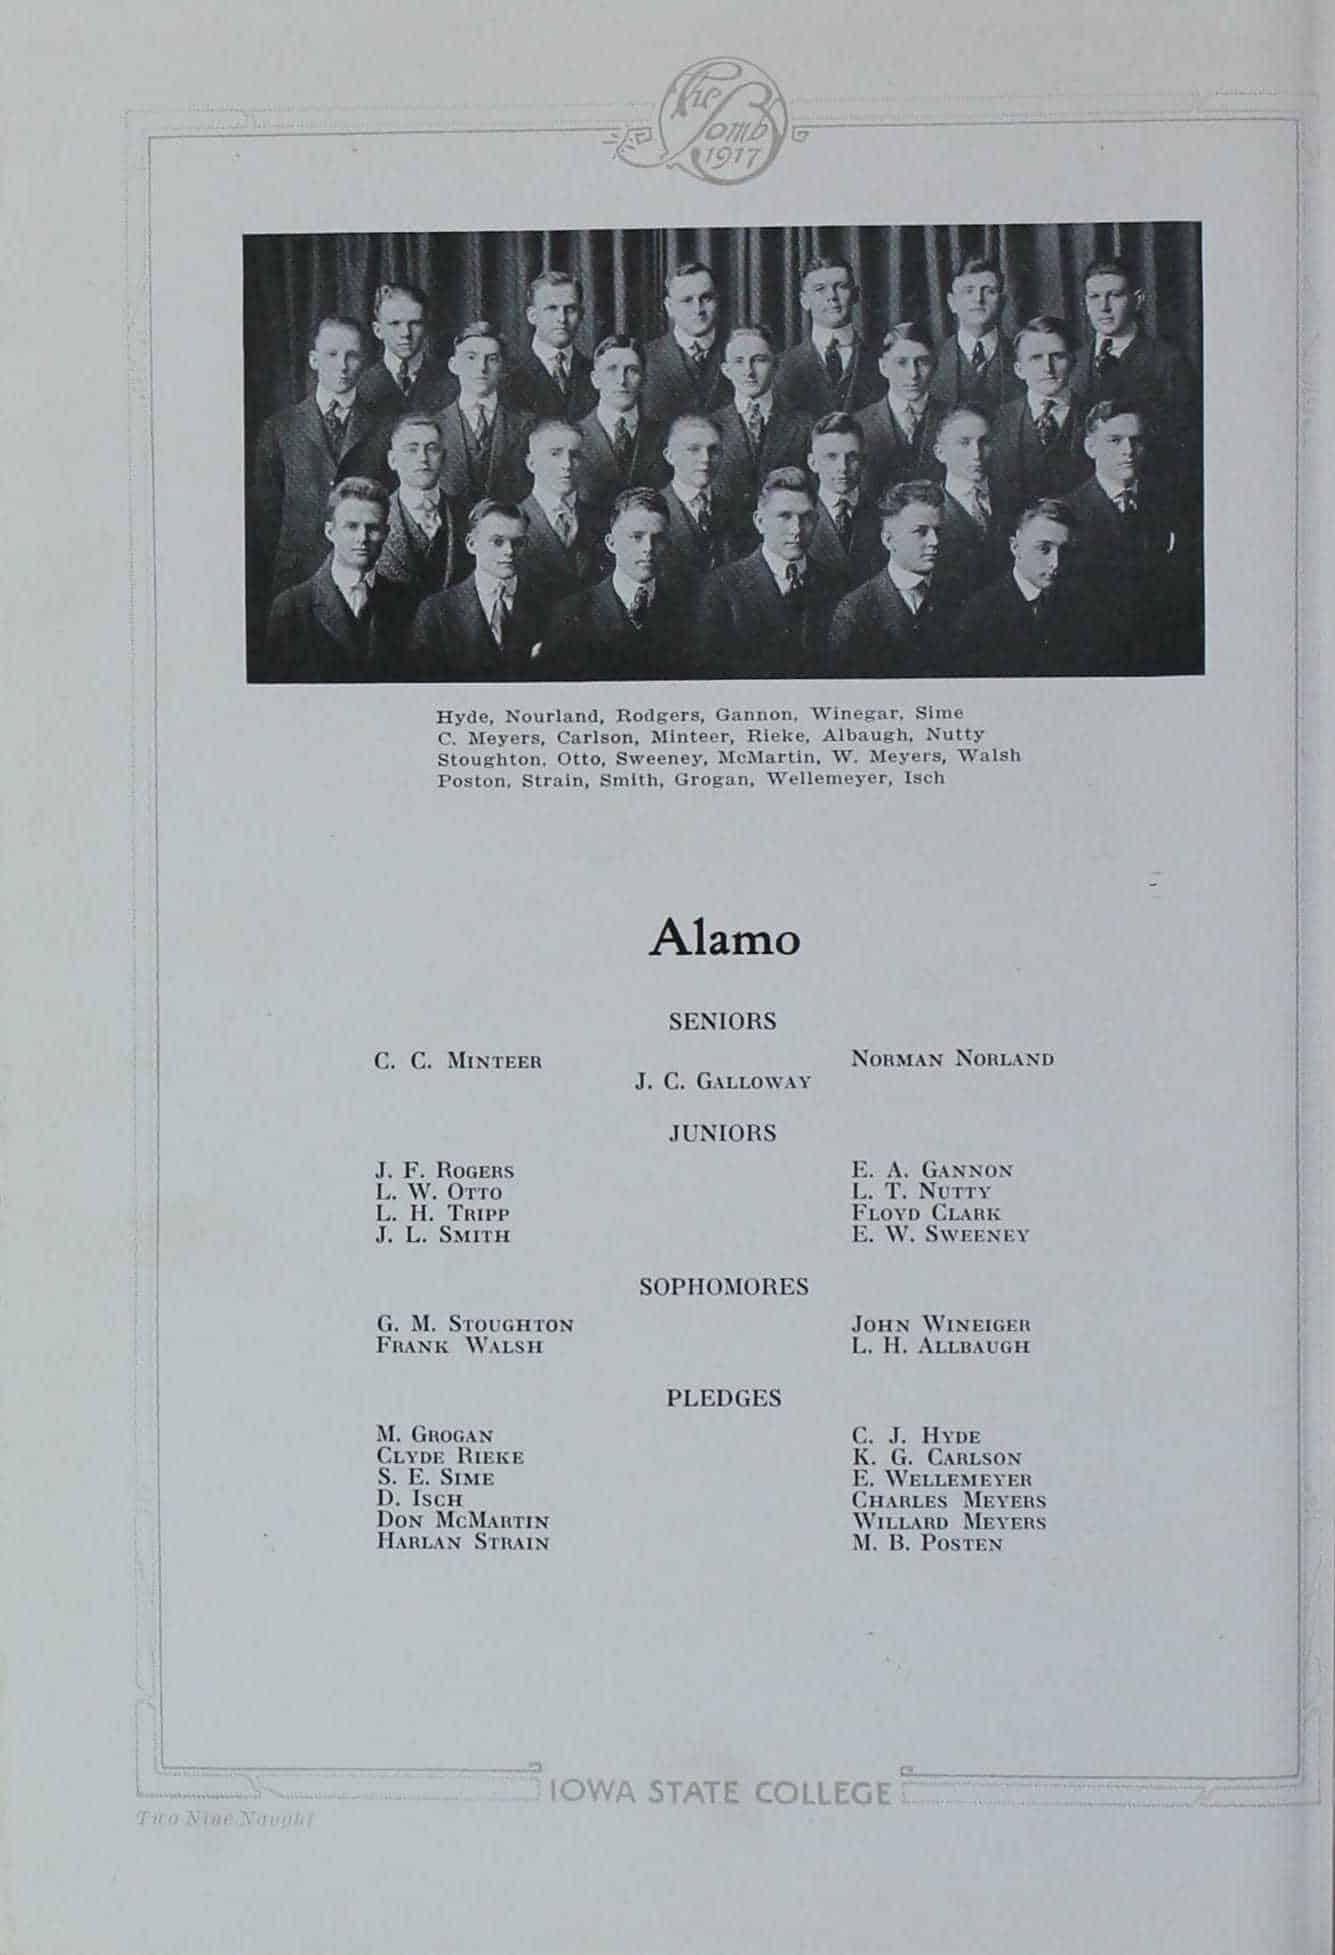 1916 Alamo Club